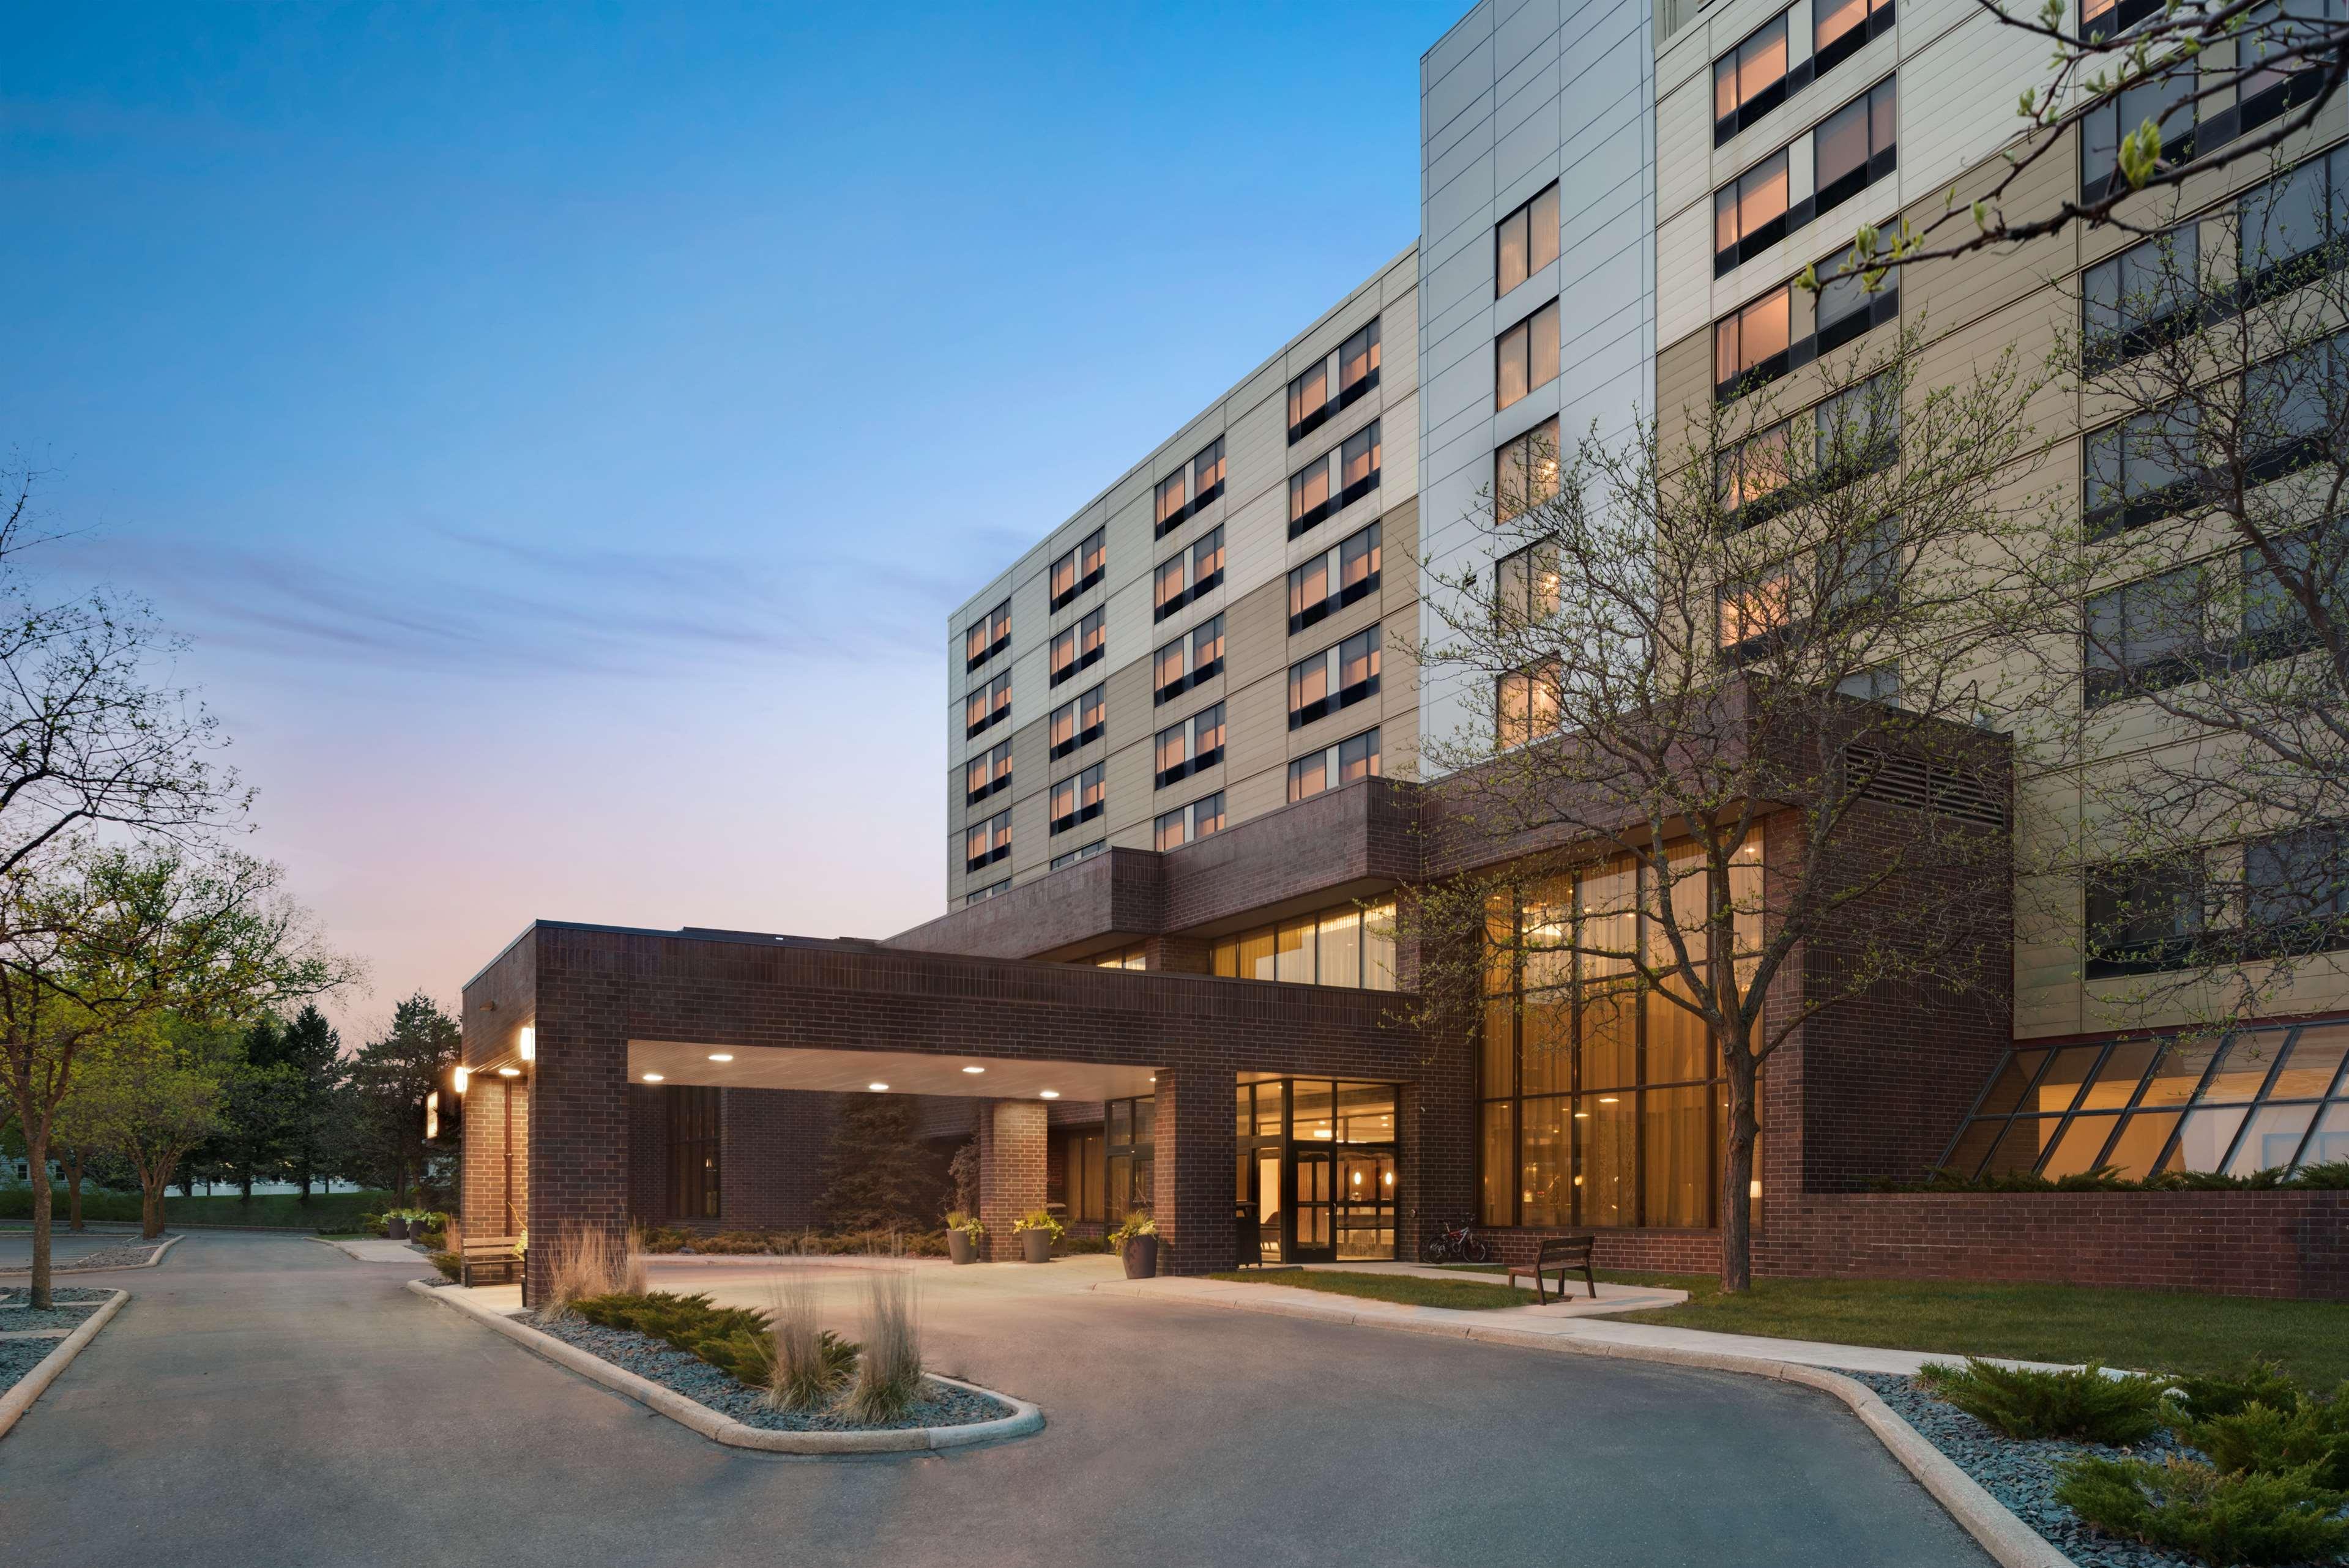 DoubleTree by Hilton St. Paul East image 1